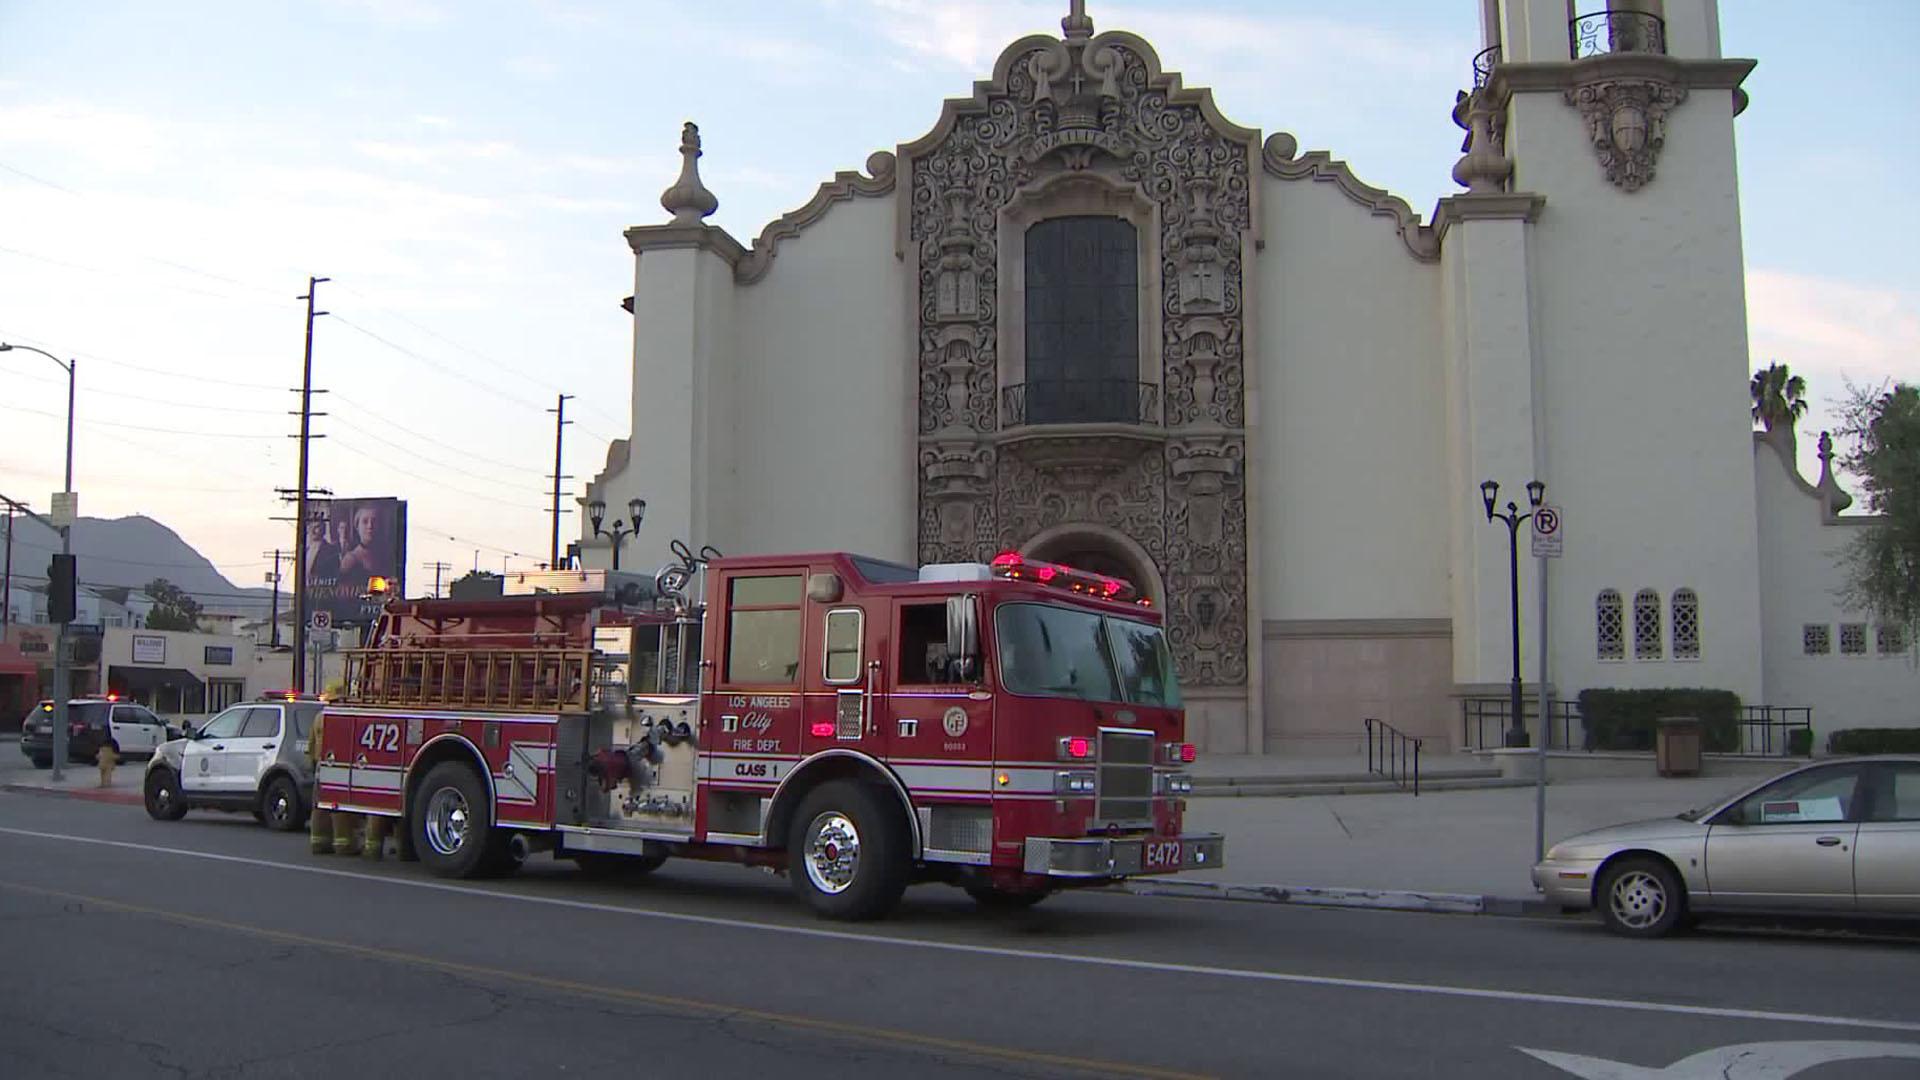 Crews respond to the St. Charles Borromeo Catholic Church in North Hollywood on July 25, 2018. (Credit: KTLA)